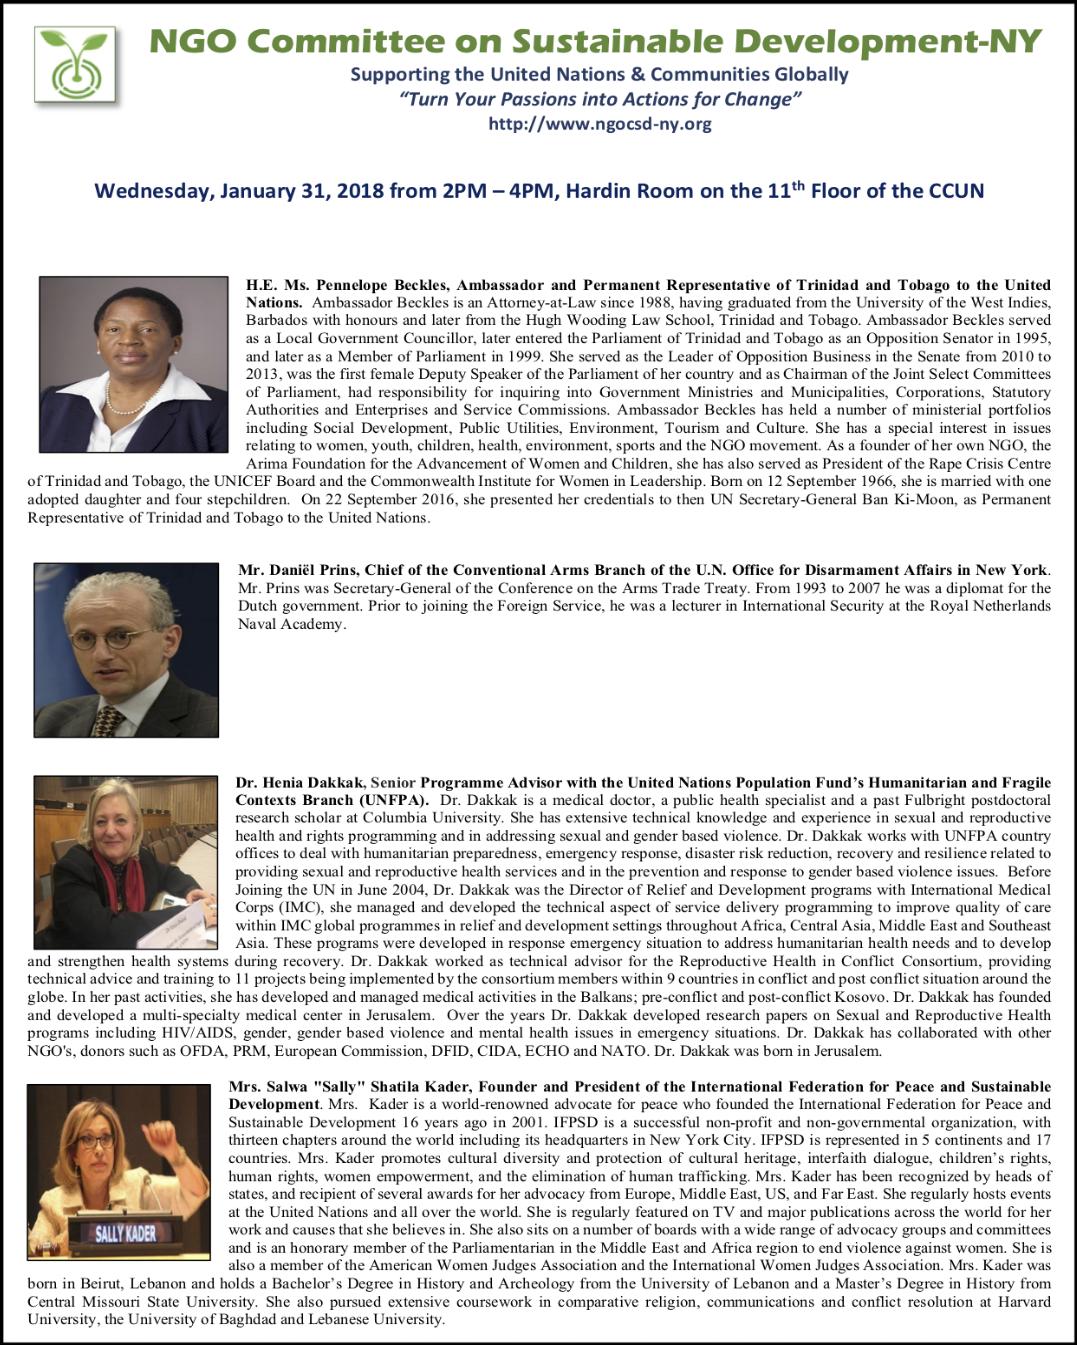 NGOCSD-NY++1-31-18+Gen.+Meeting+photo+&+bios+A1a (1).png